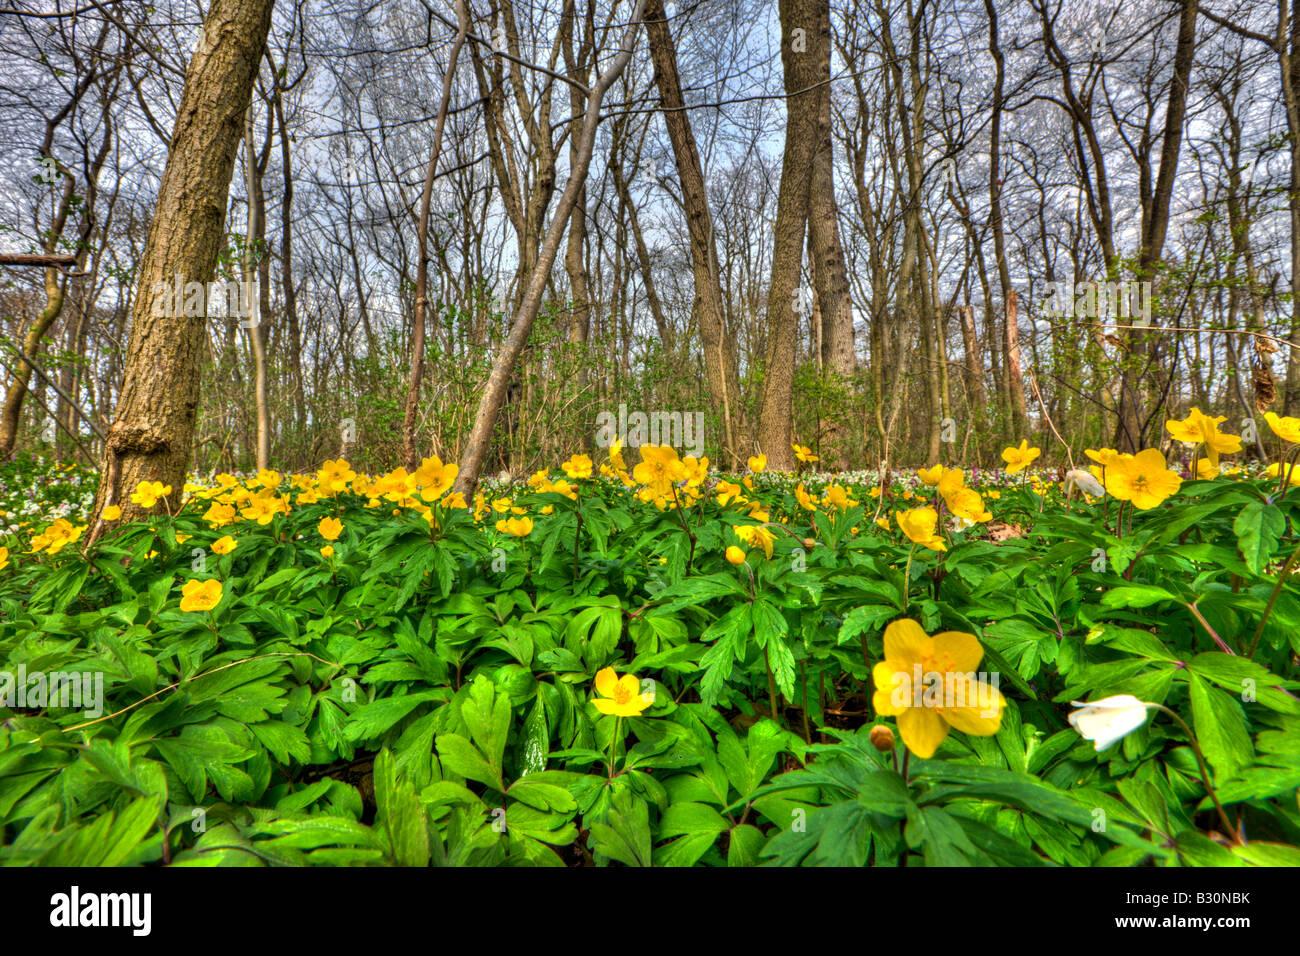 Yellow Anemones Anemone ranunculoides Germany Munich Bavaria - Stock Image